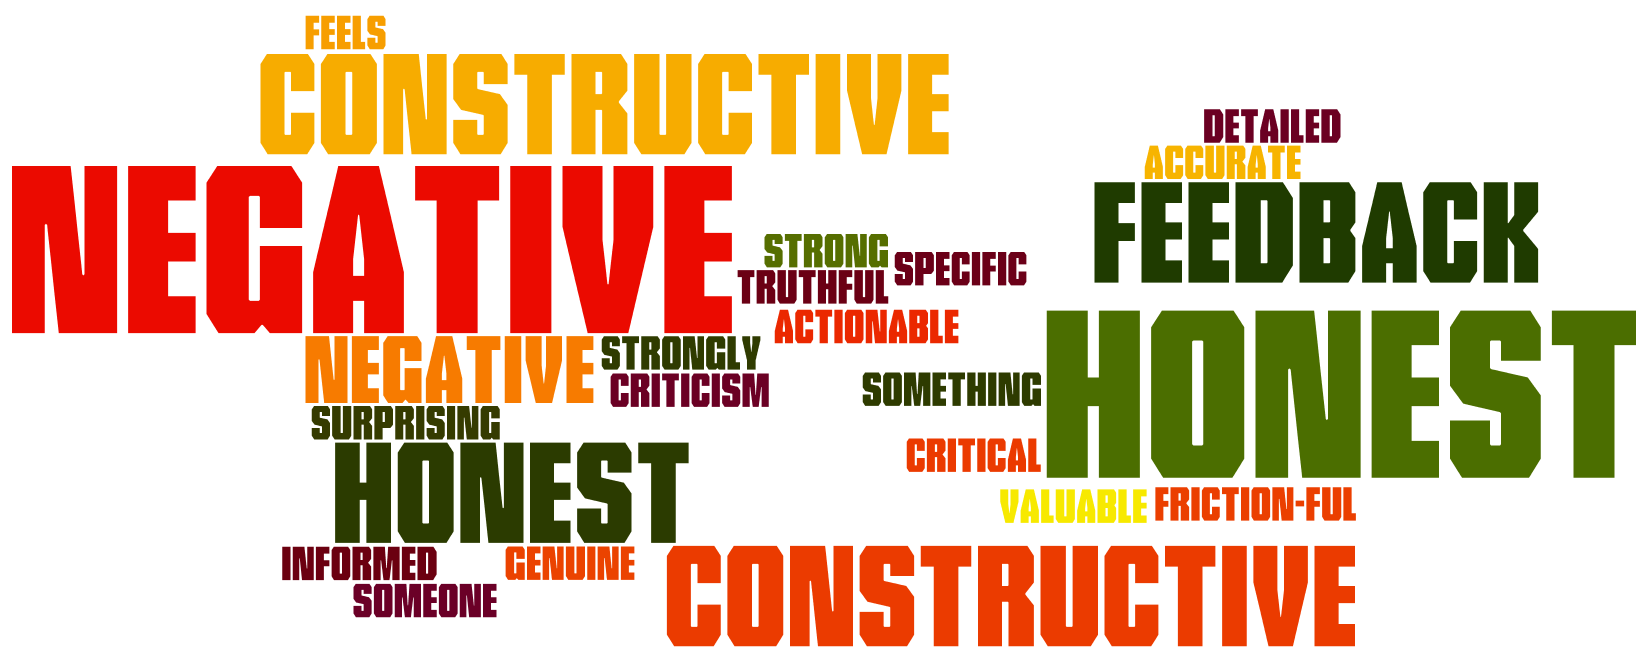 most_useful_feedback-1